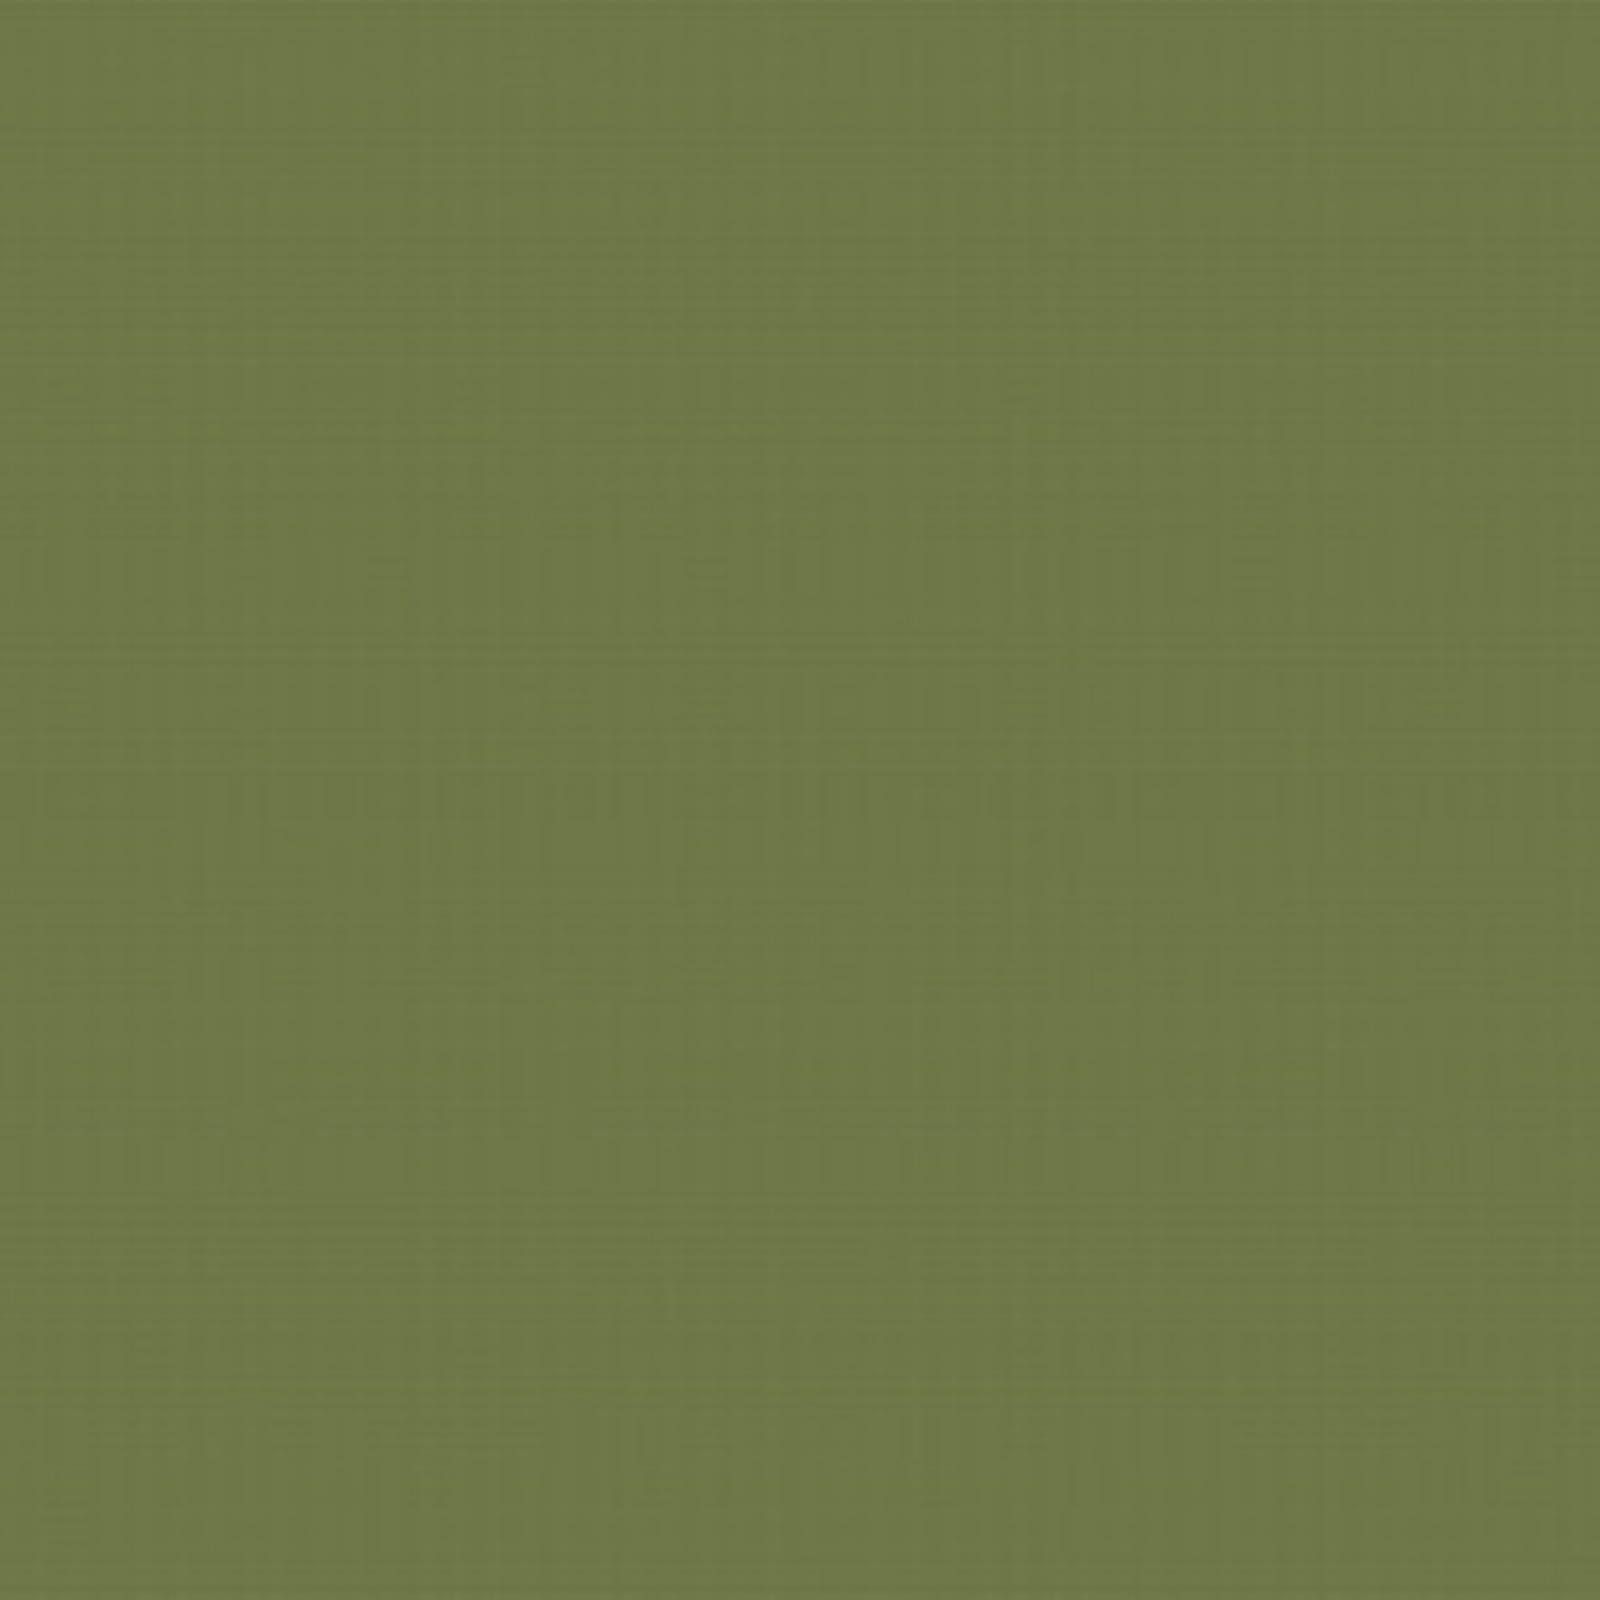 verde masliniu